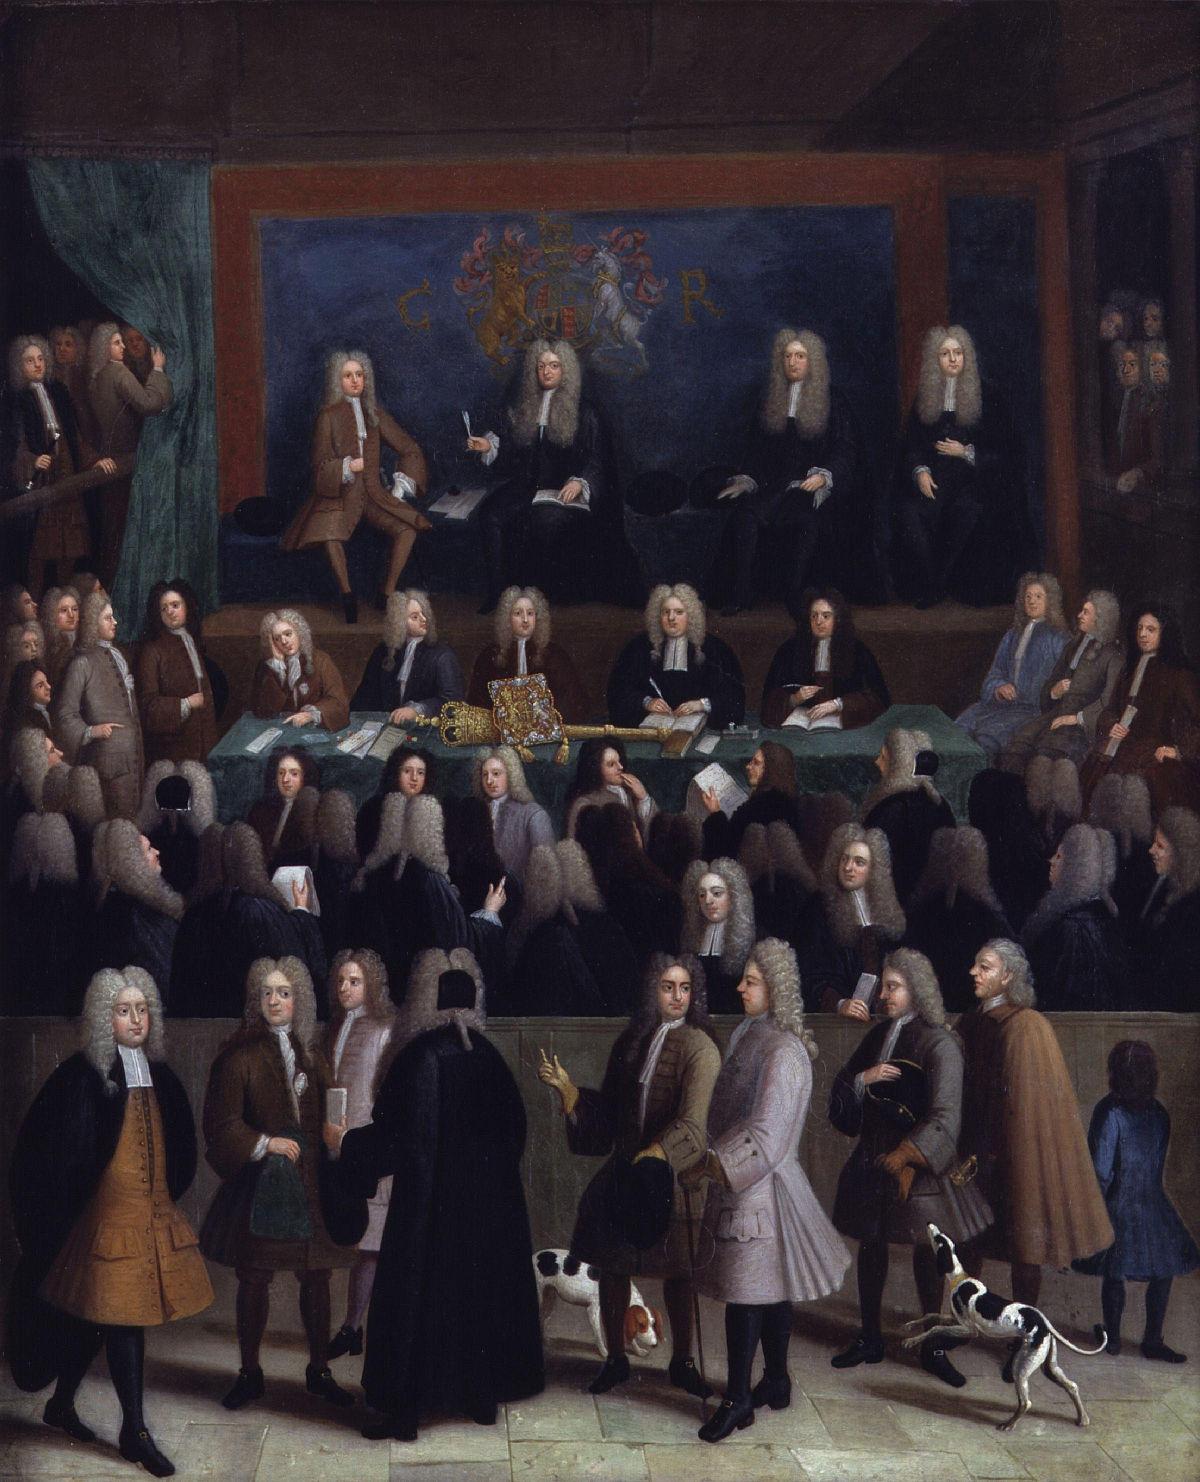 court of chancery - wikipedia